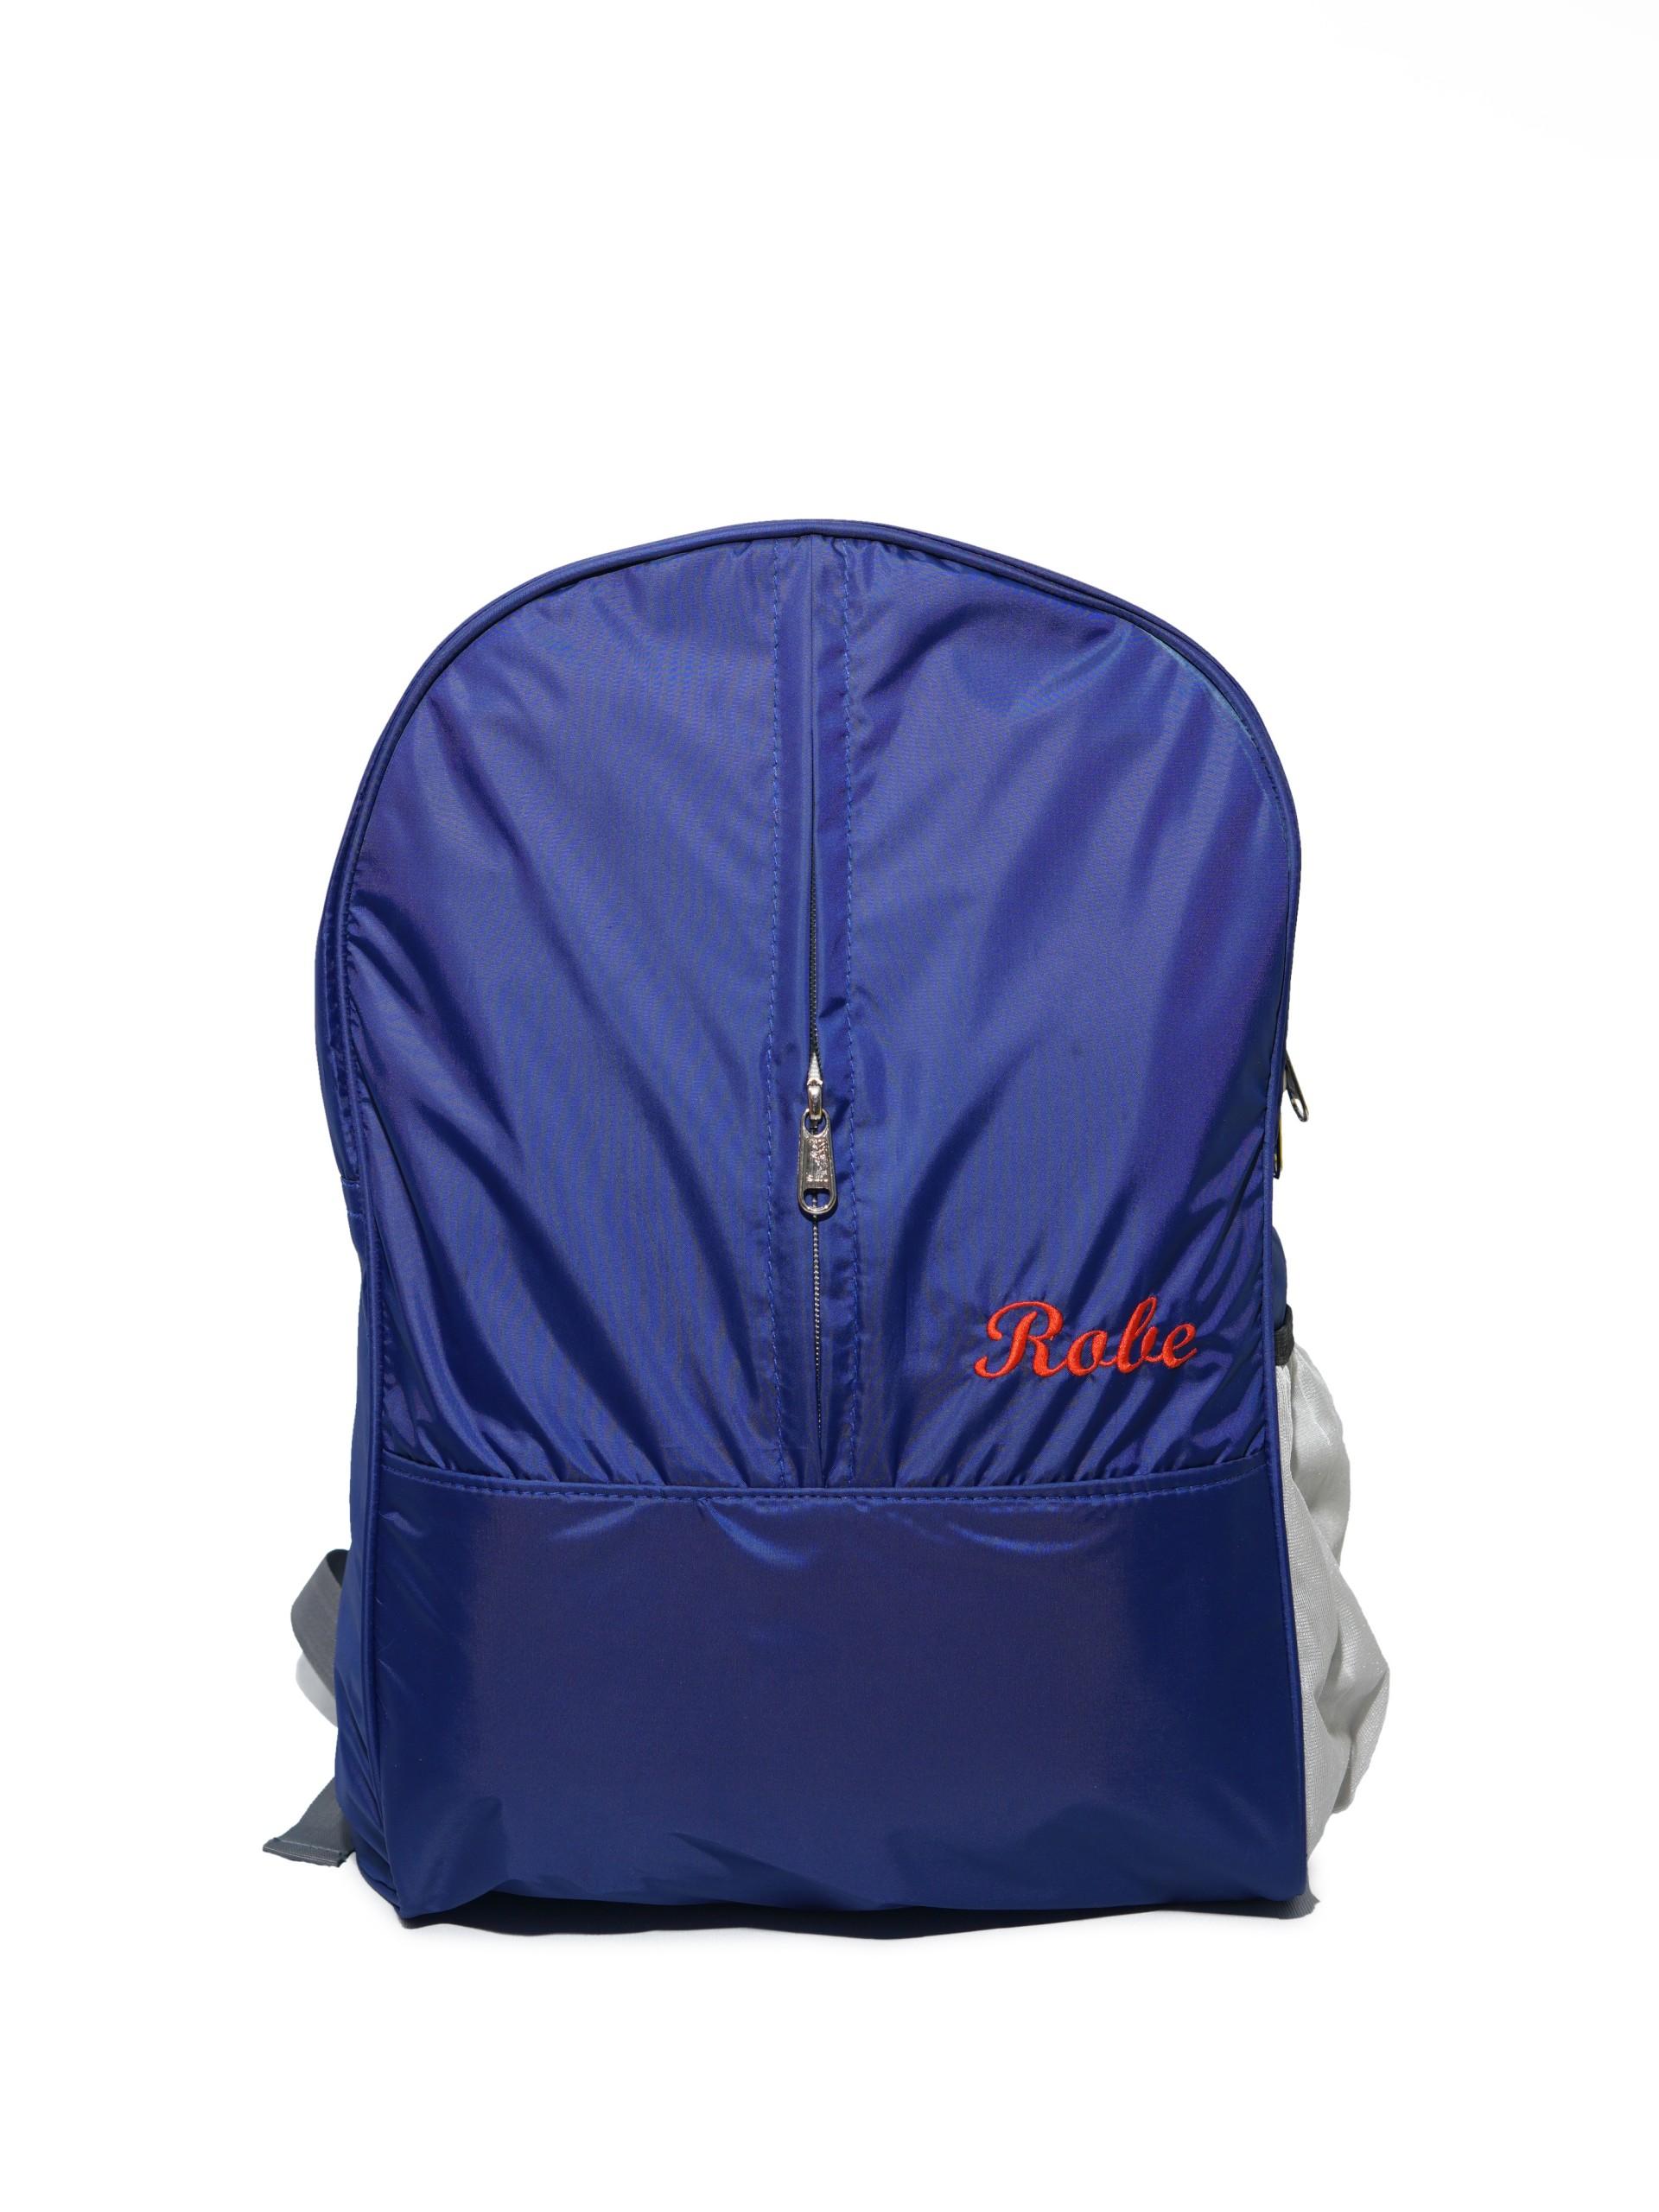 School Bag in white background